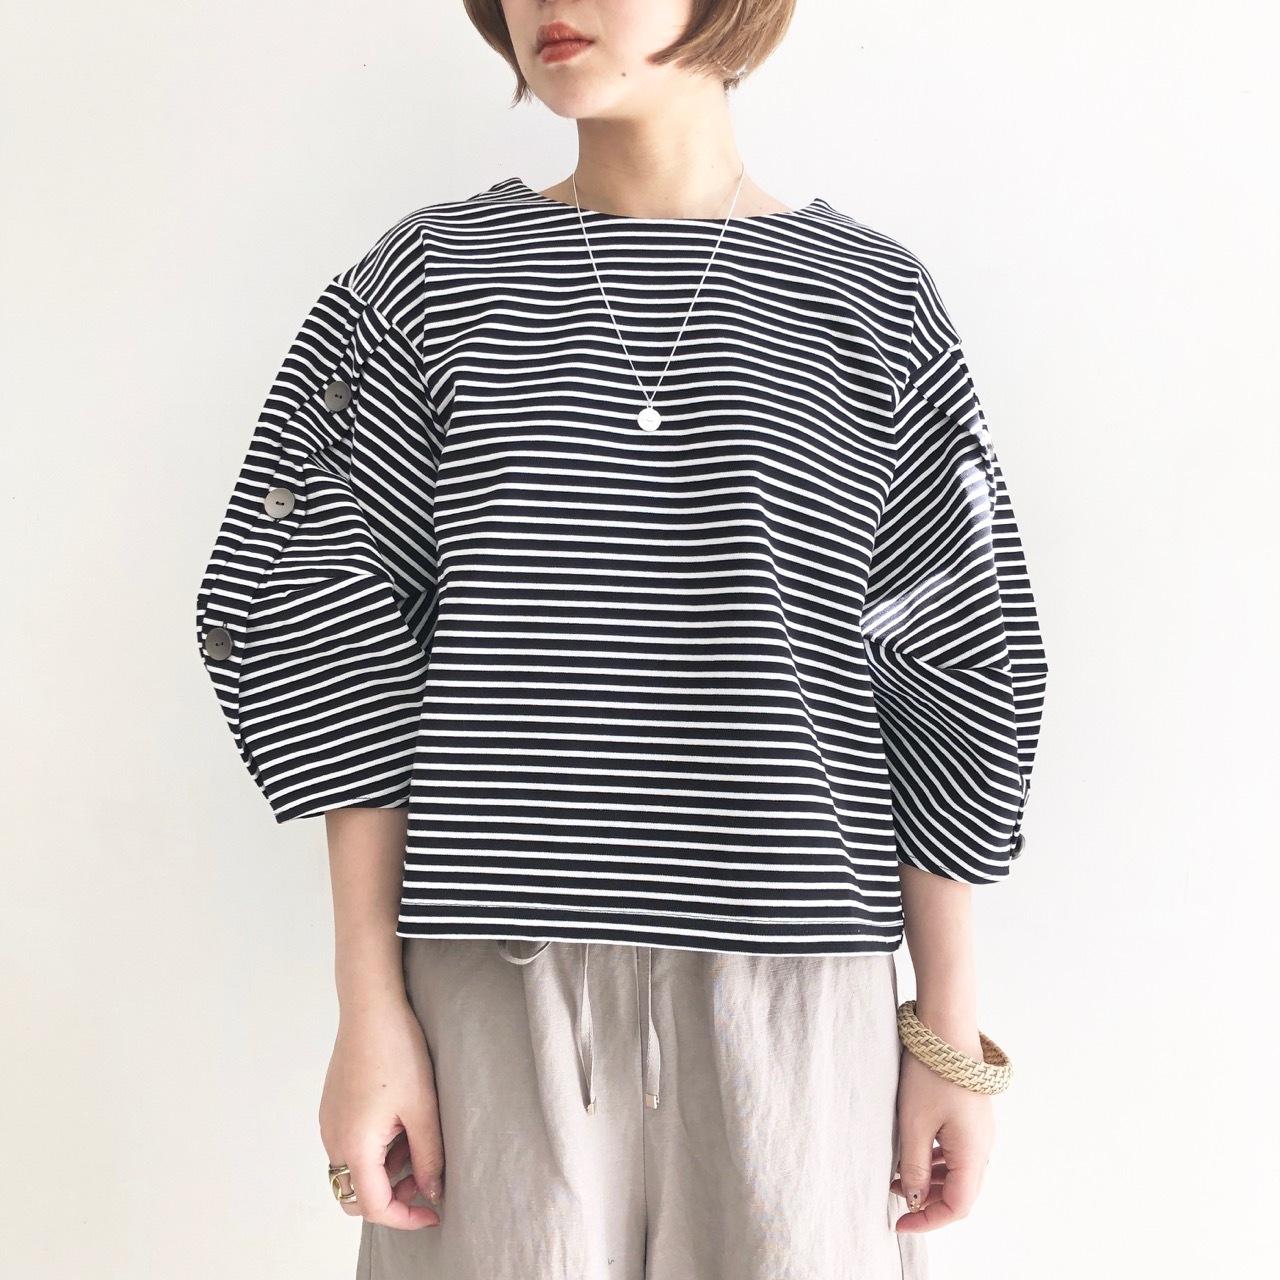 【 CYNICAL 】ボーダーTeeシャツ